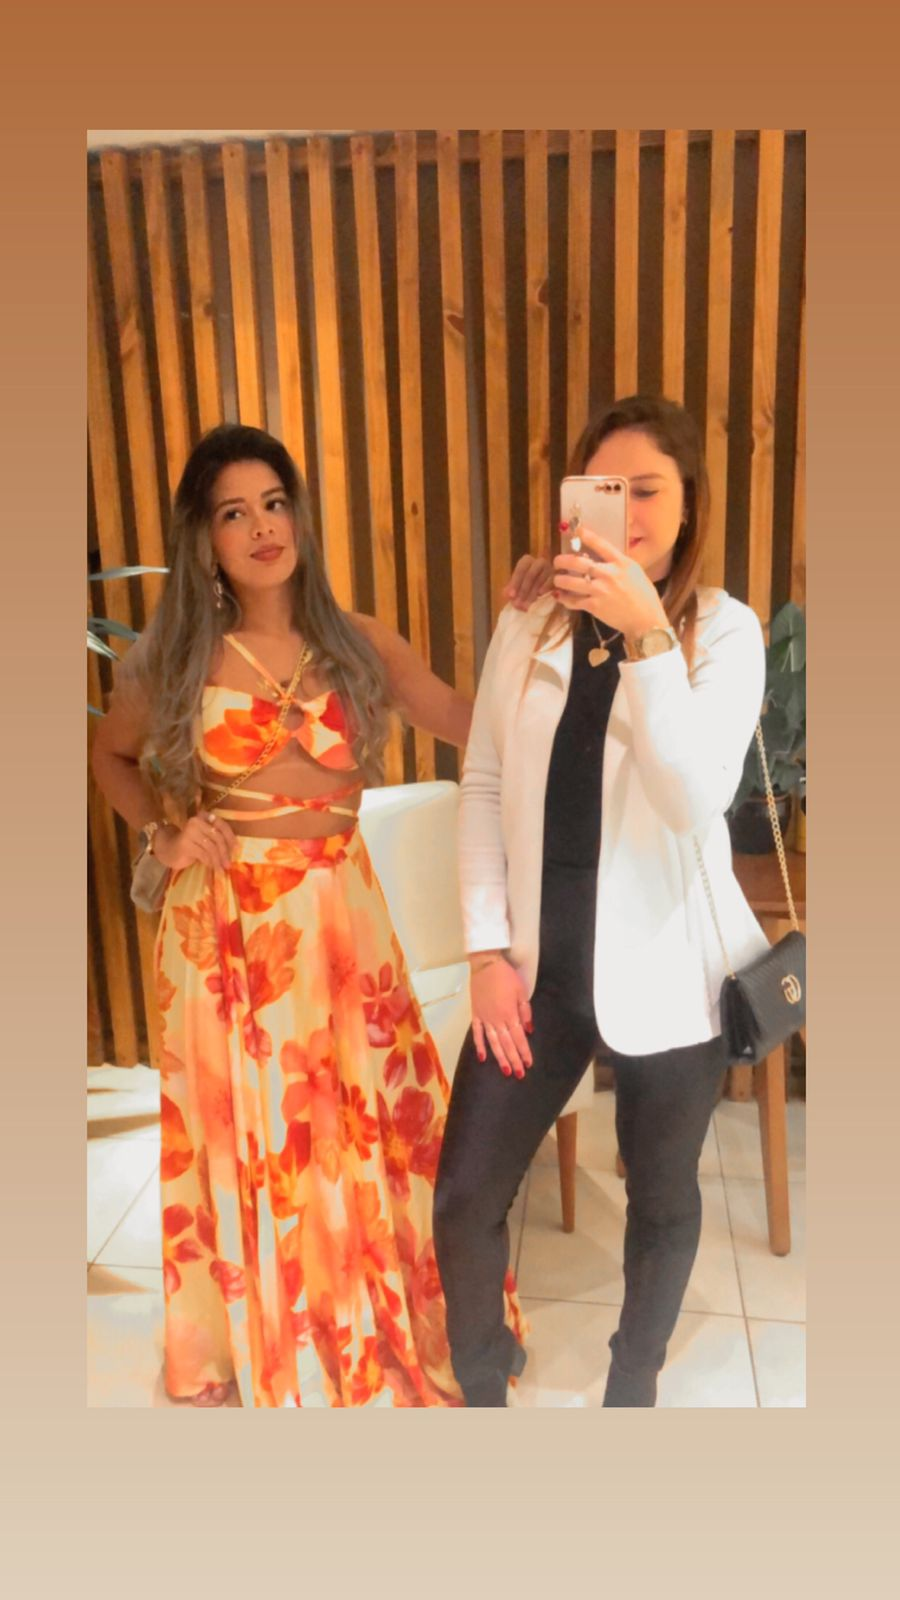 nicole-2-1 Nicole e Rayssa